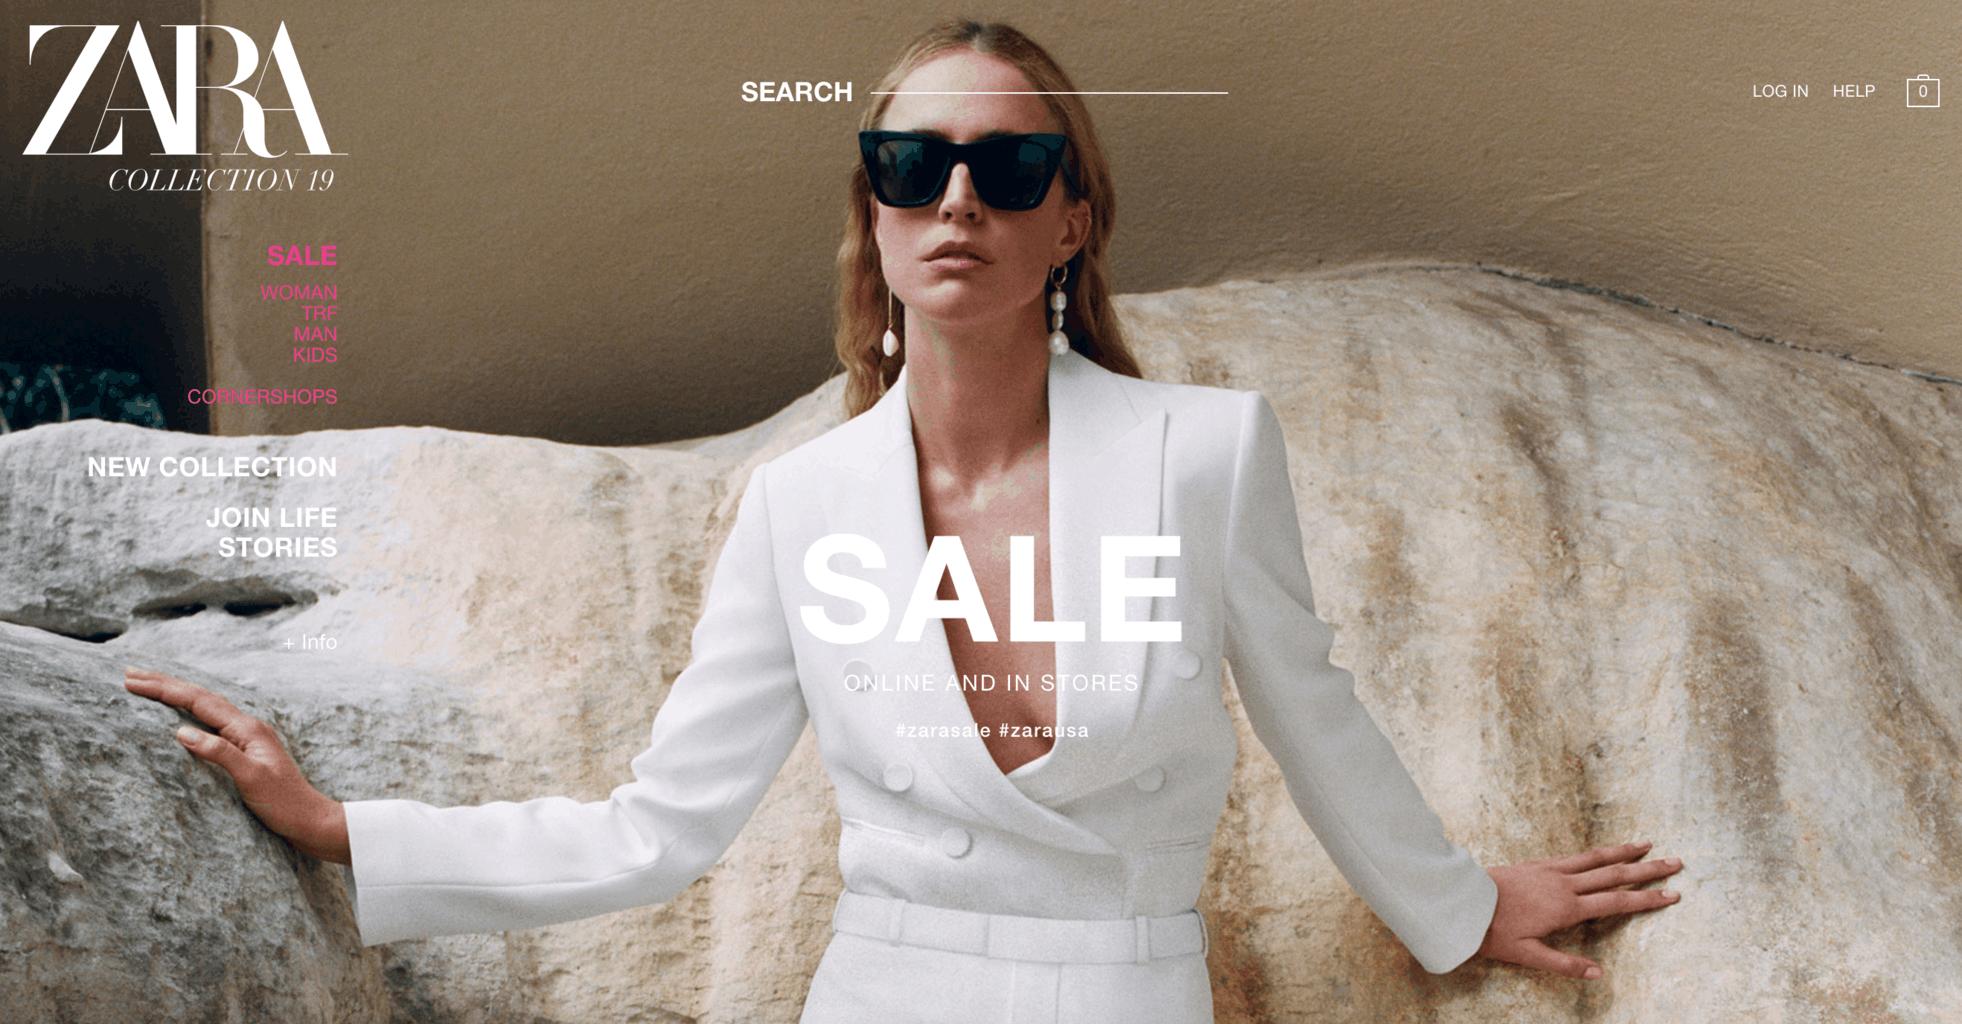 Zara Sale 2019: Details & Best Items to Buy College Fashion